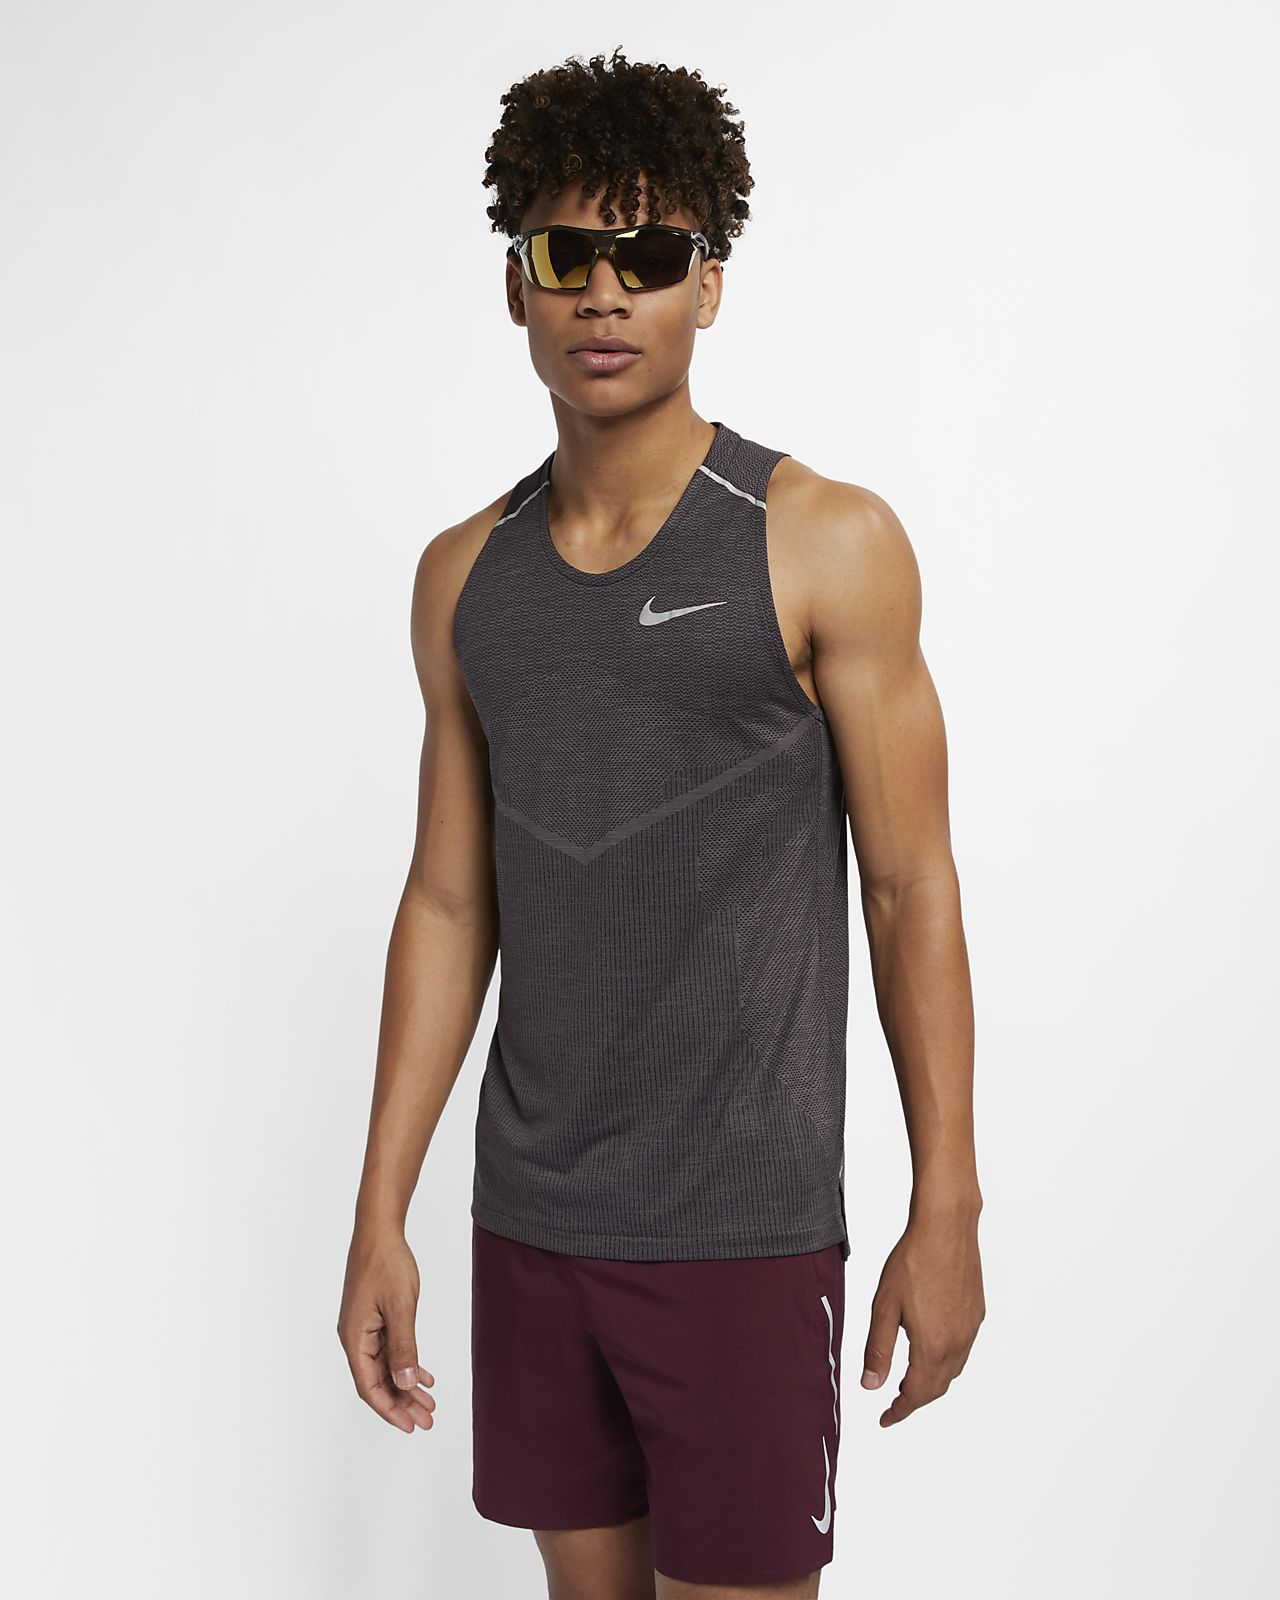 Nike TechKnit Cool Herren-Lauf-Tank